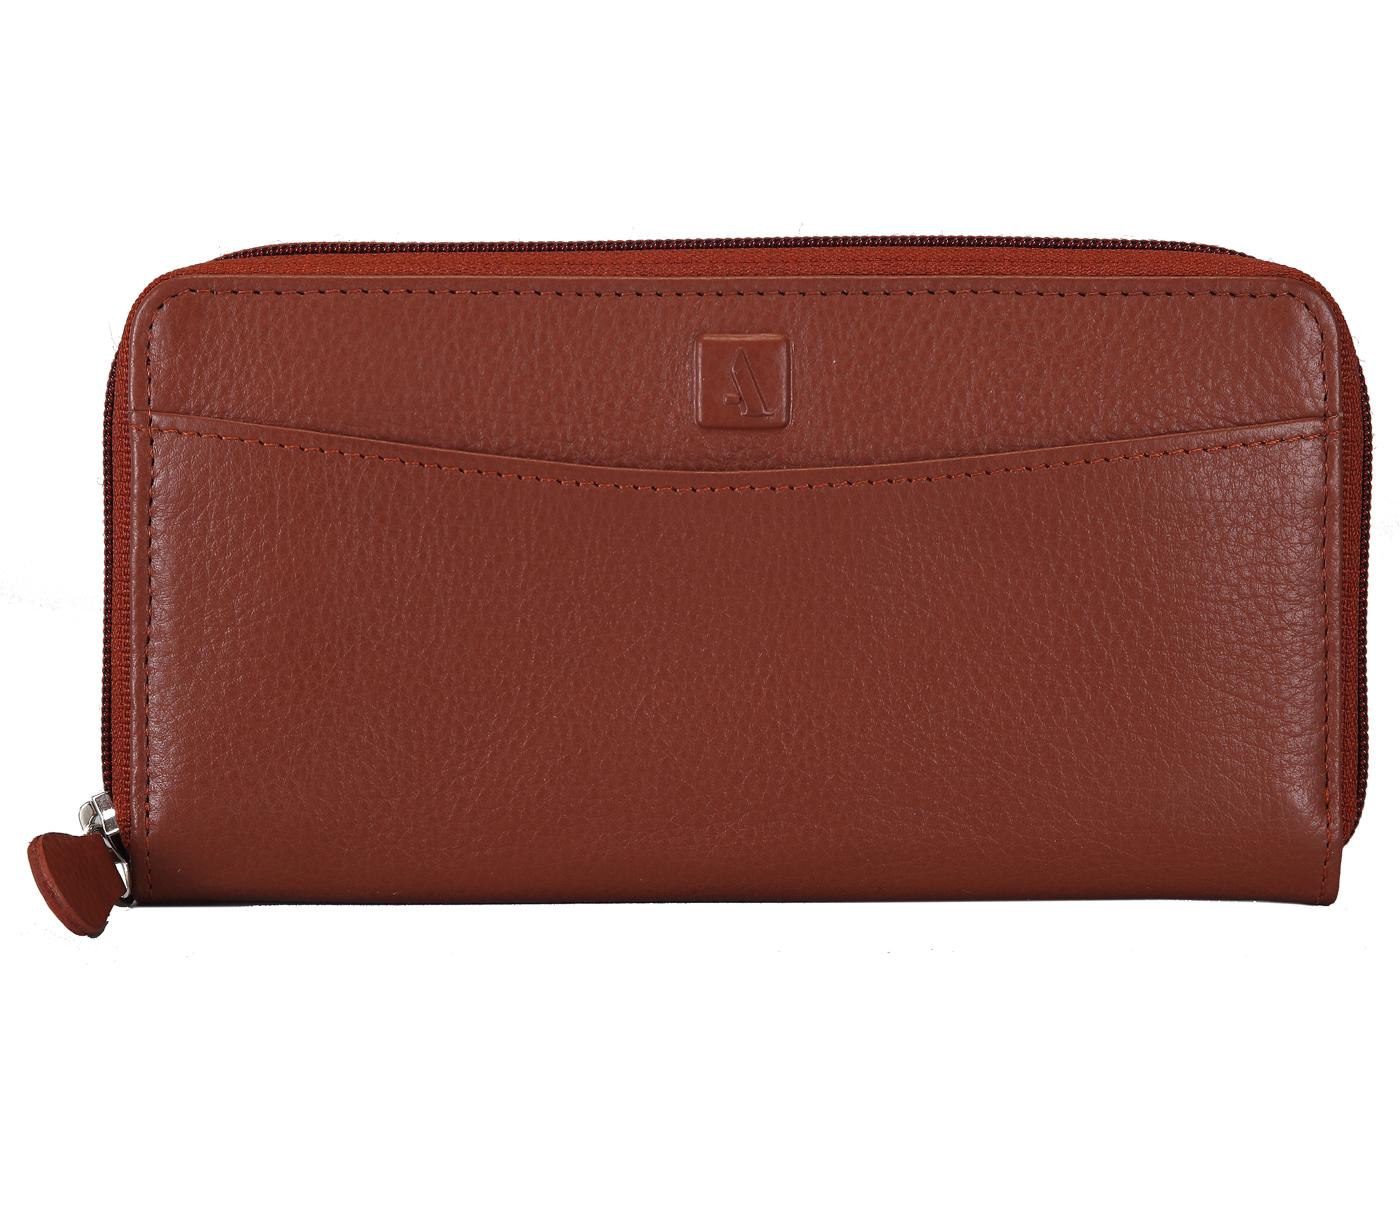 Freida Leather Wallet(Tan)W35